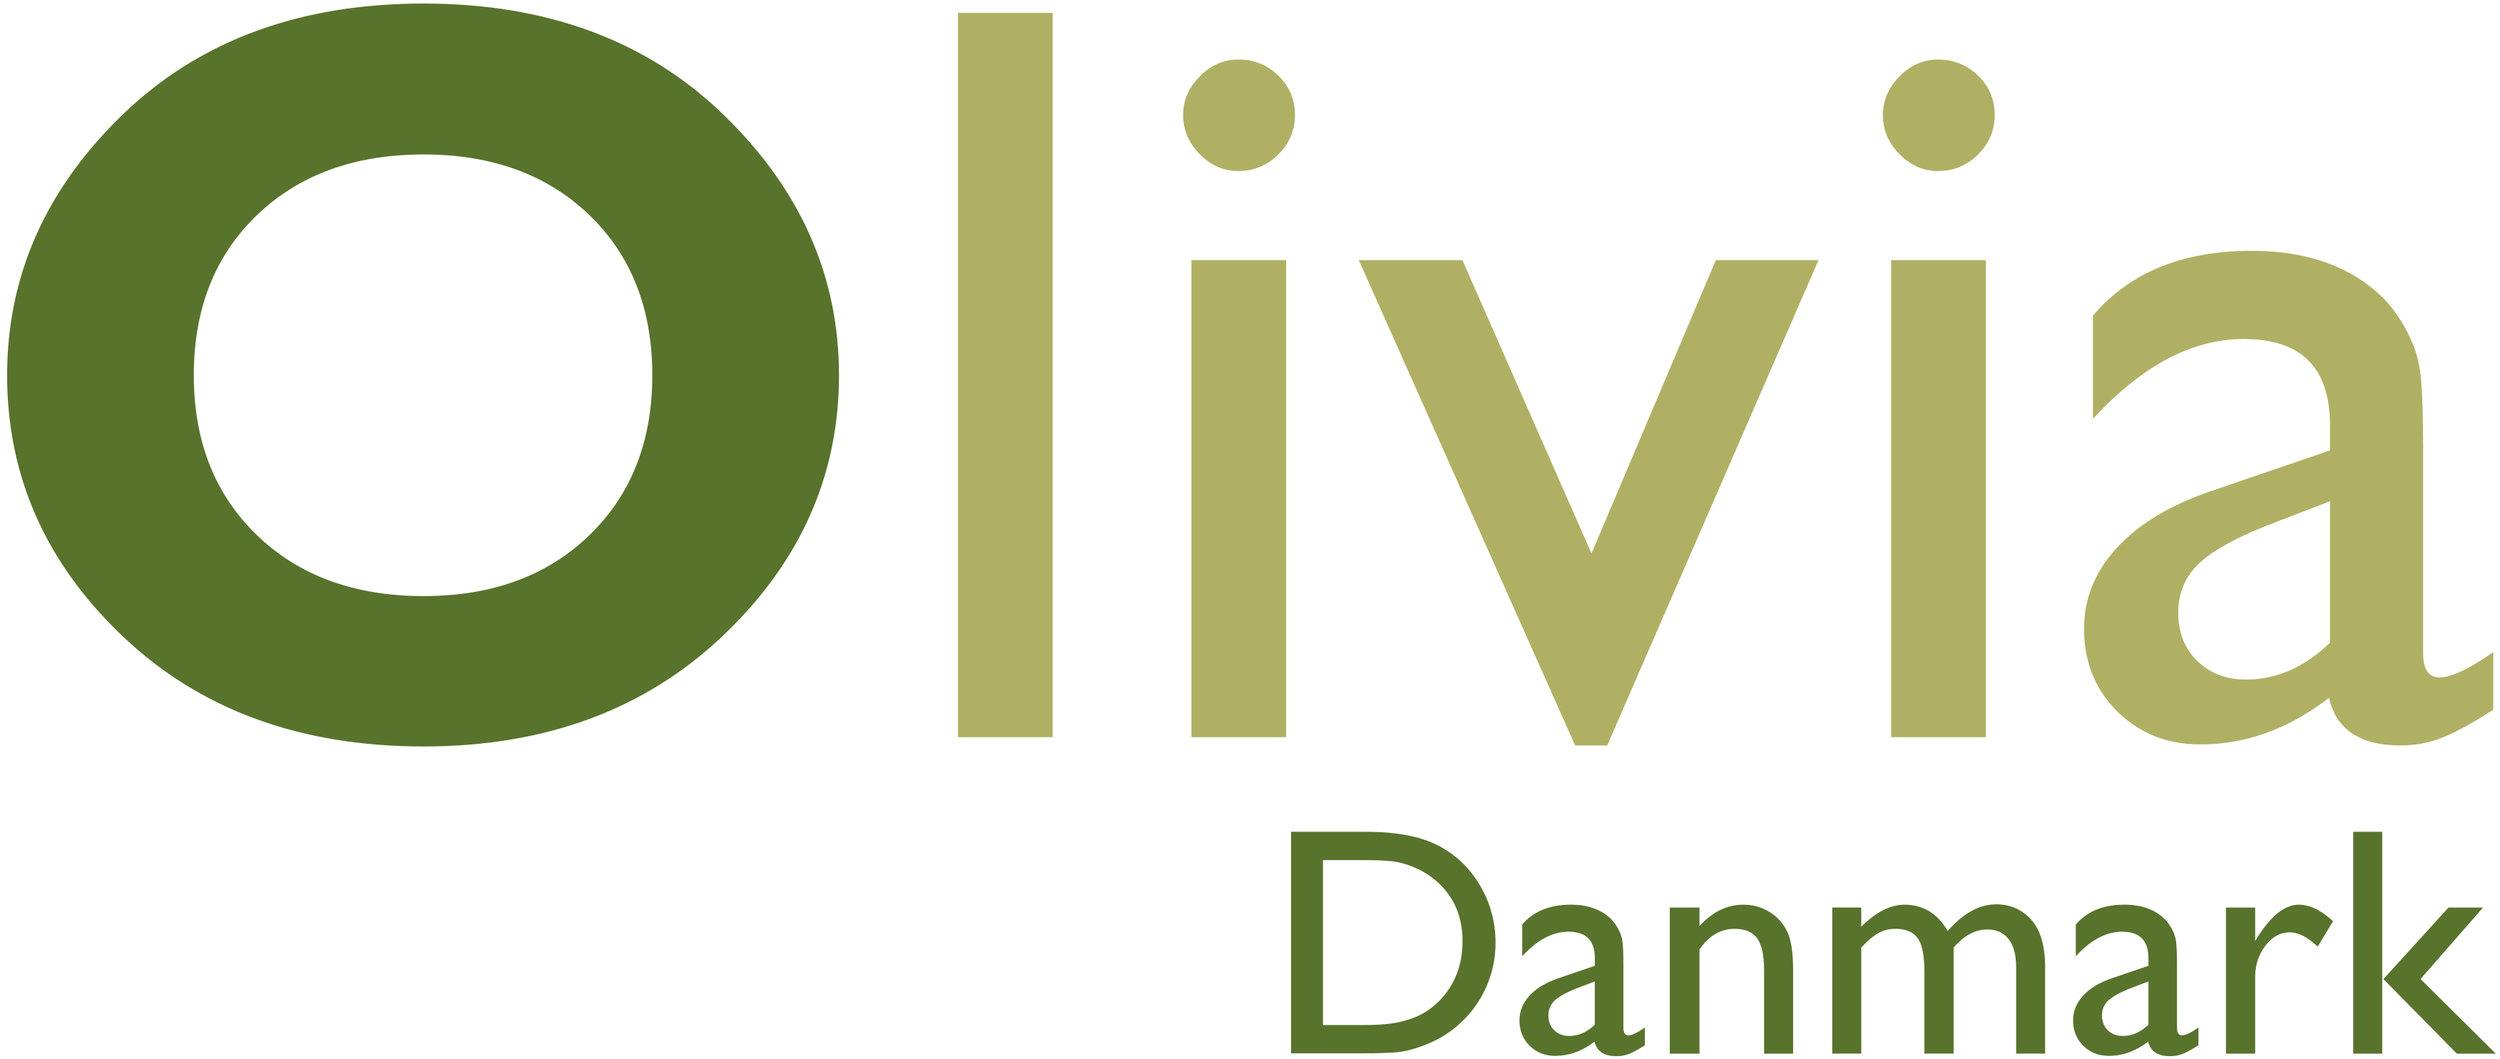 Olivia_DK_logo.jpg